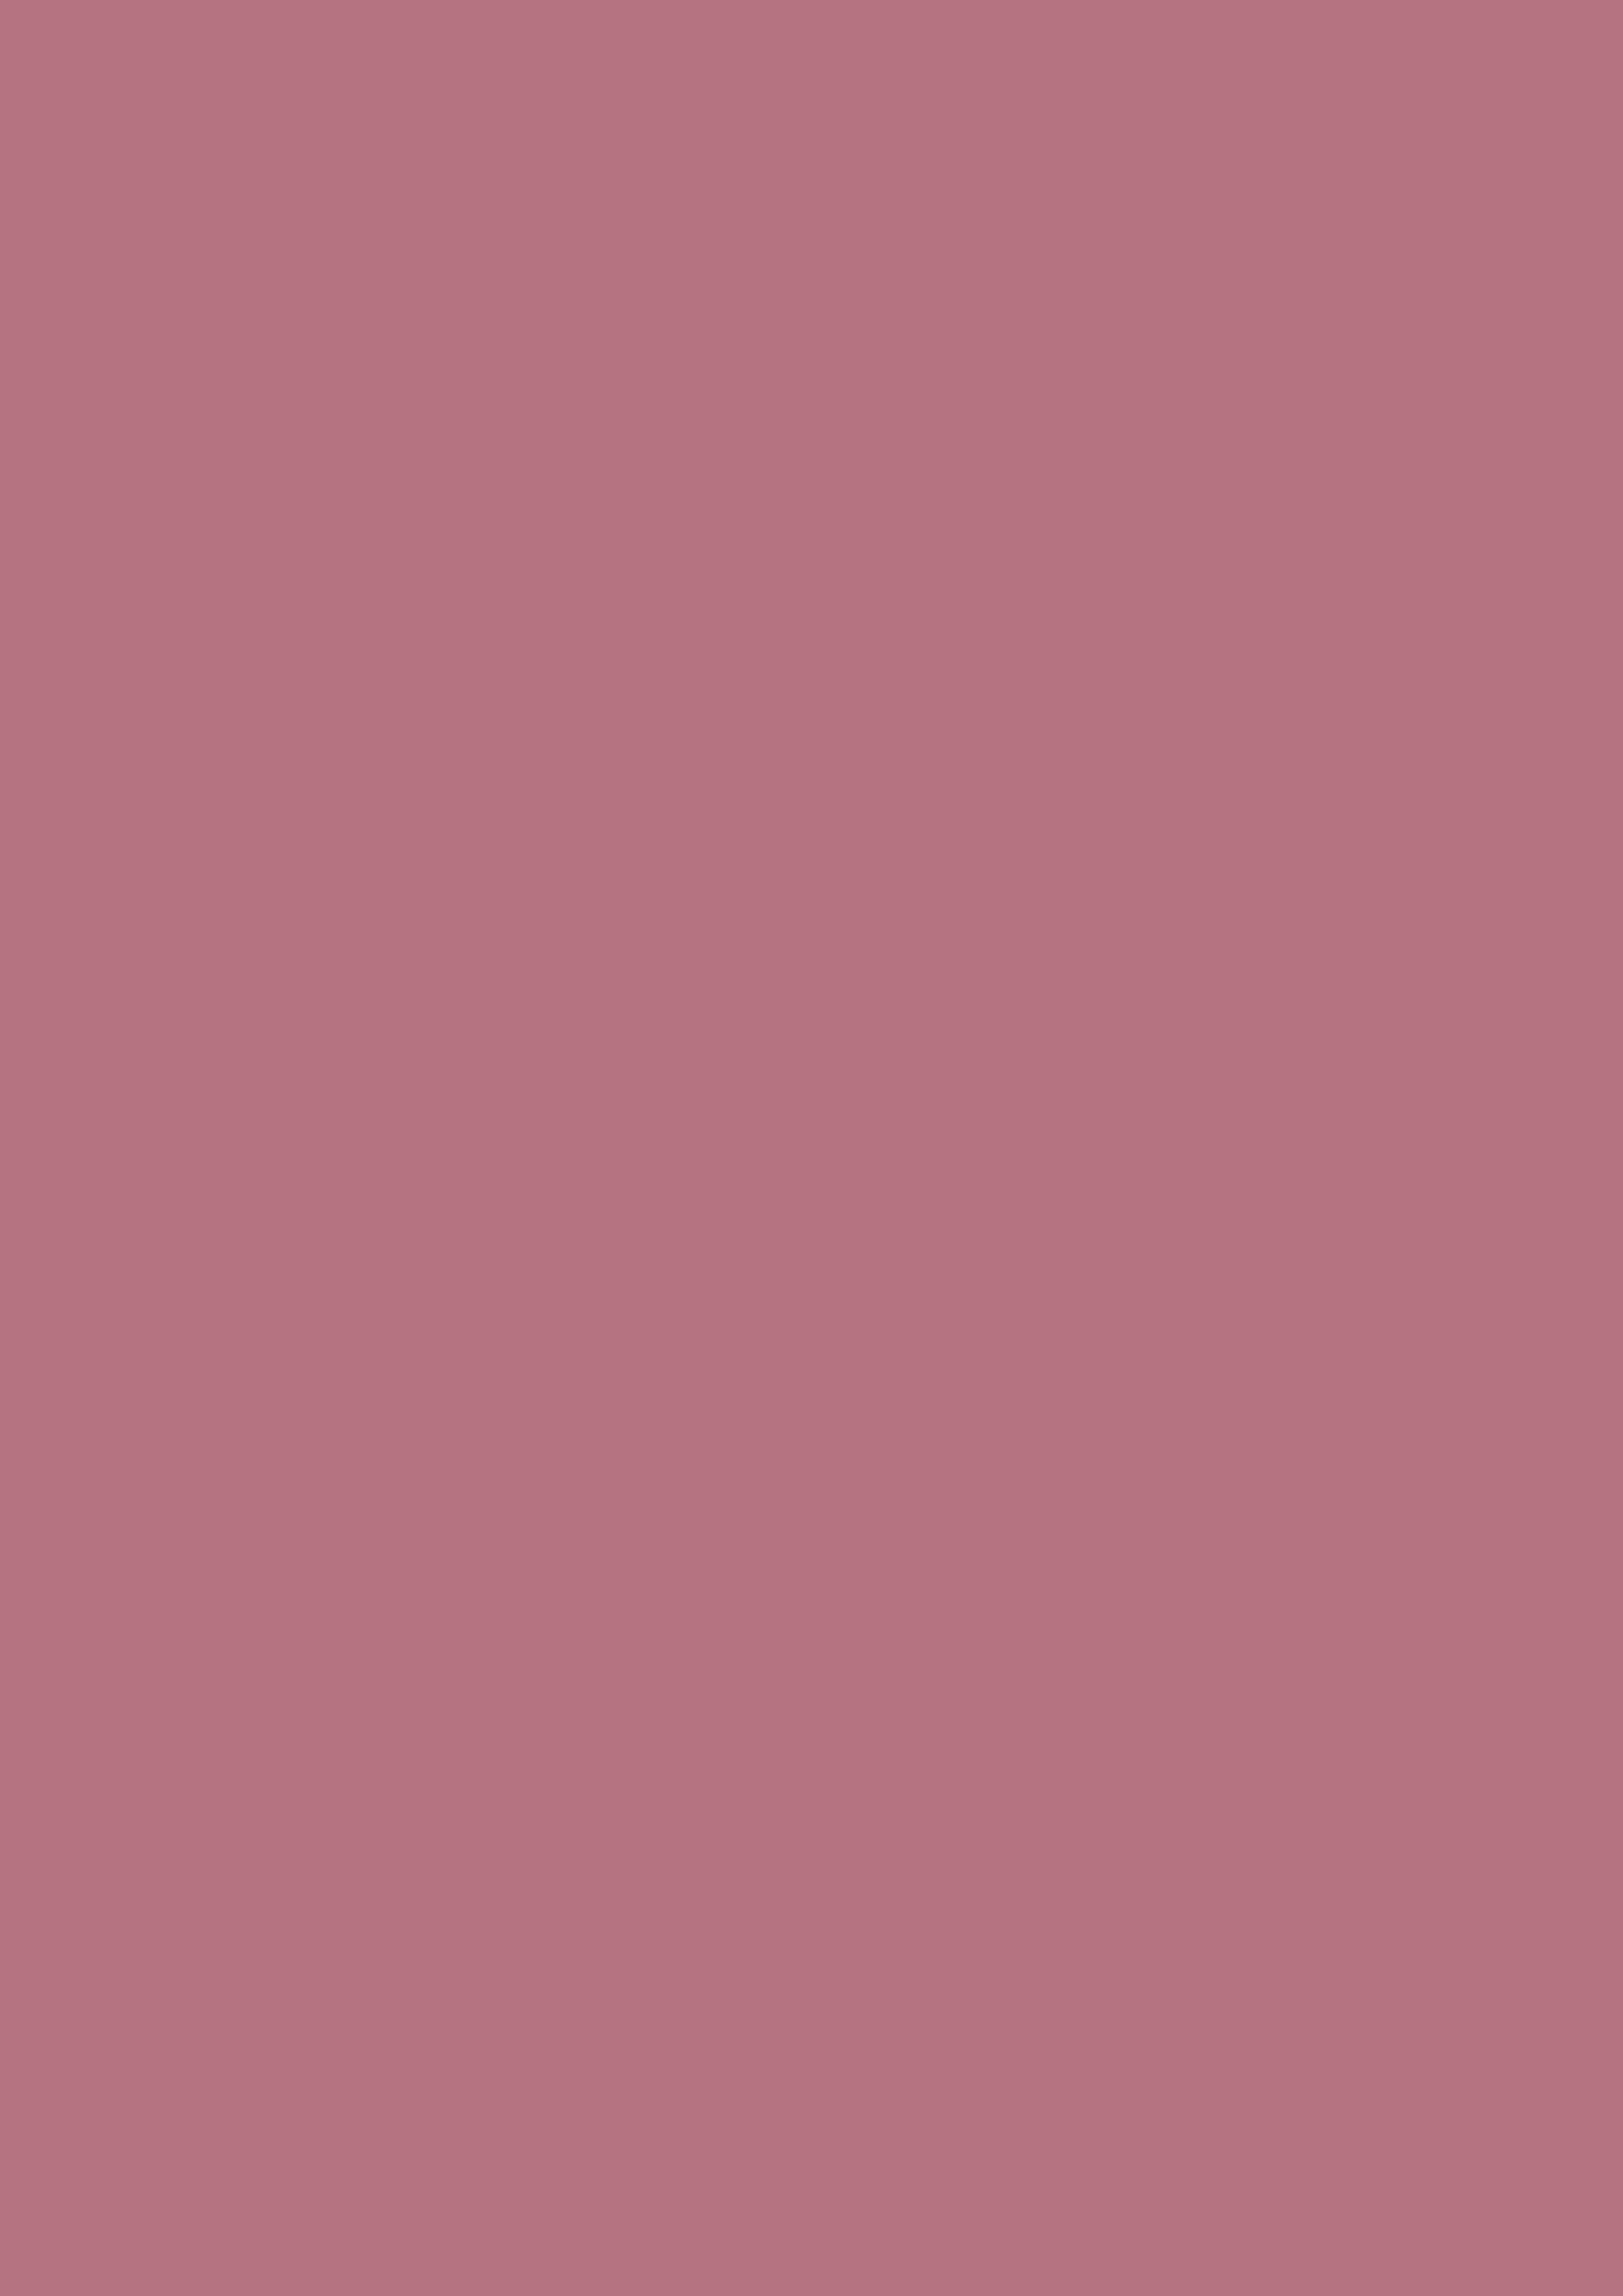 2480x3508 Turkish Rose Solid Color Background